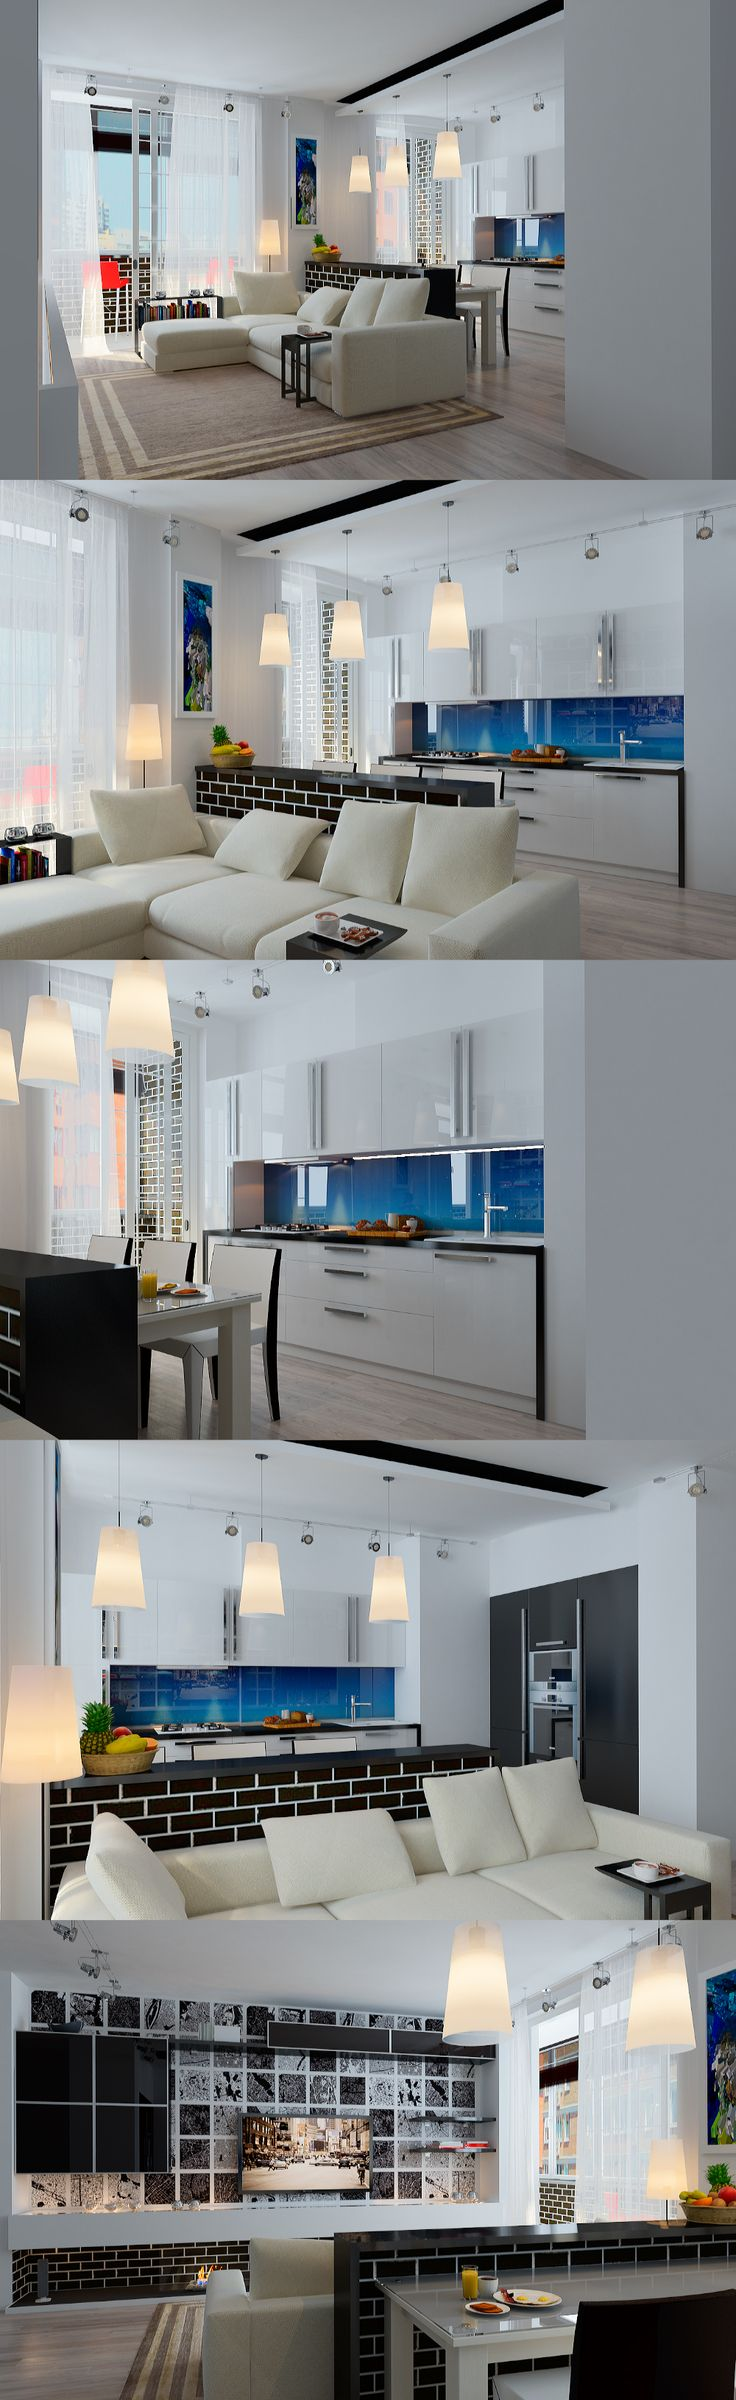 Modern living room. Grey walls, neutral colors